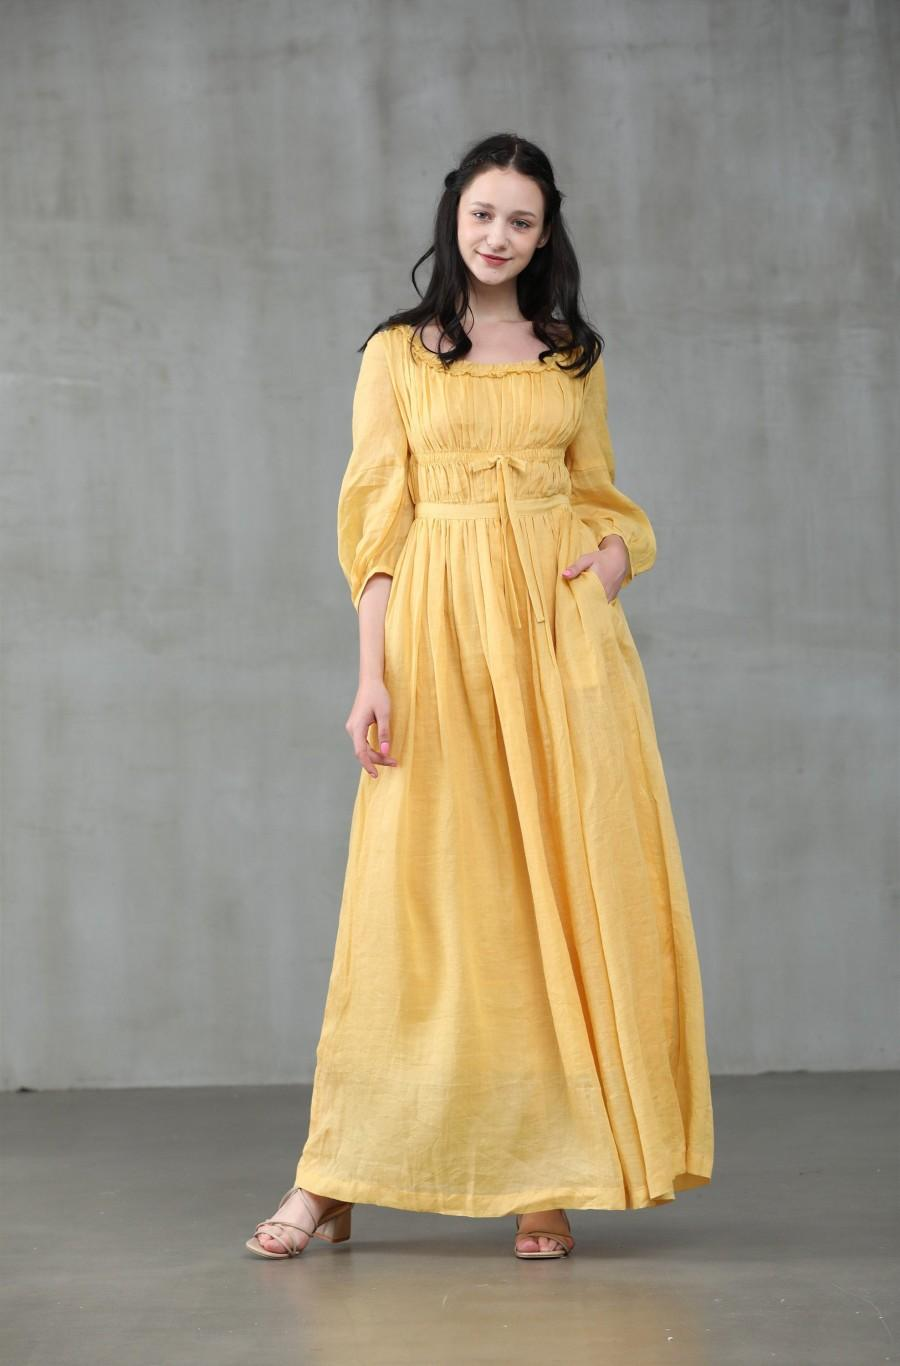 Wedding - maxi linen dress in yellow, ruffle dress, bridal dress, wedding dress, layered dress, princess dress